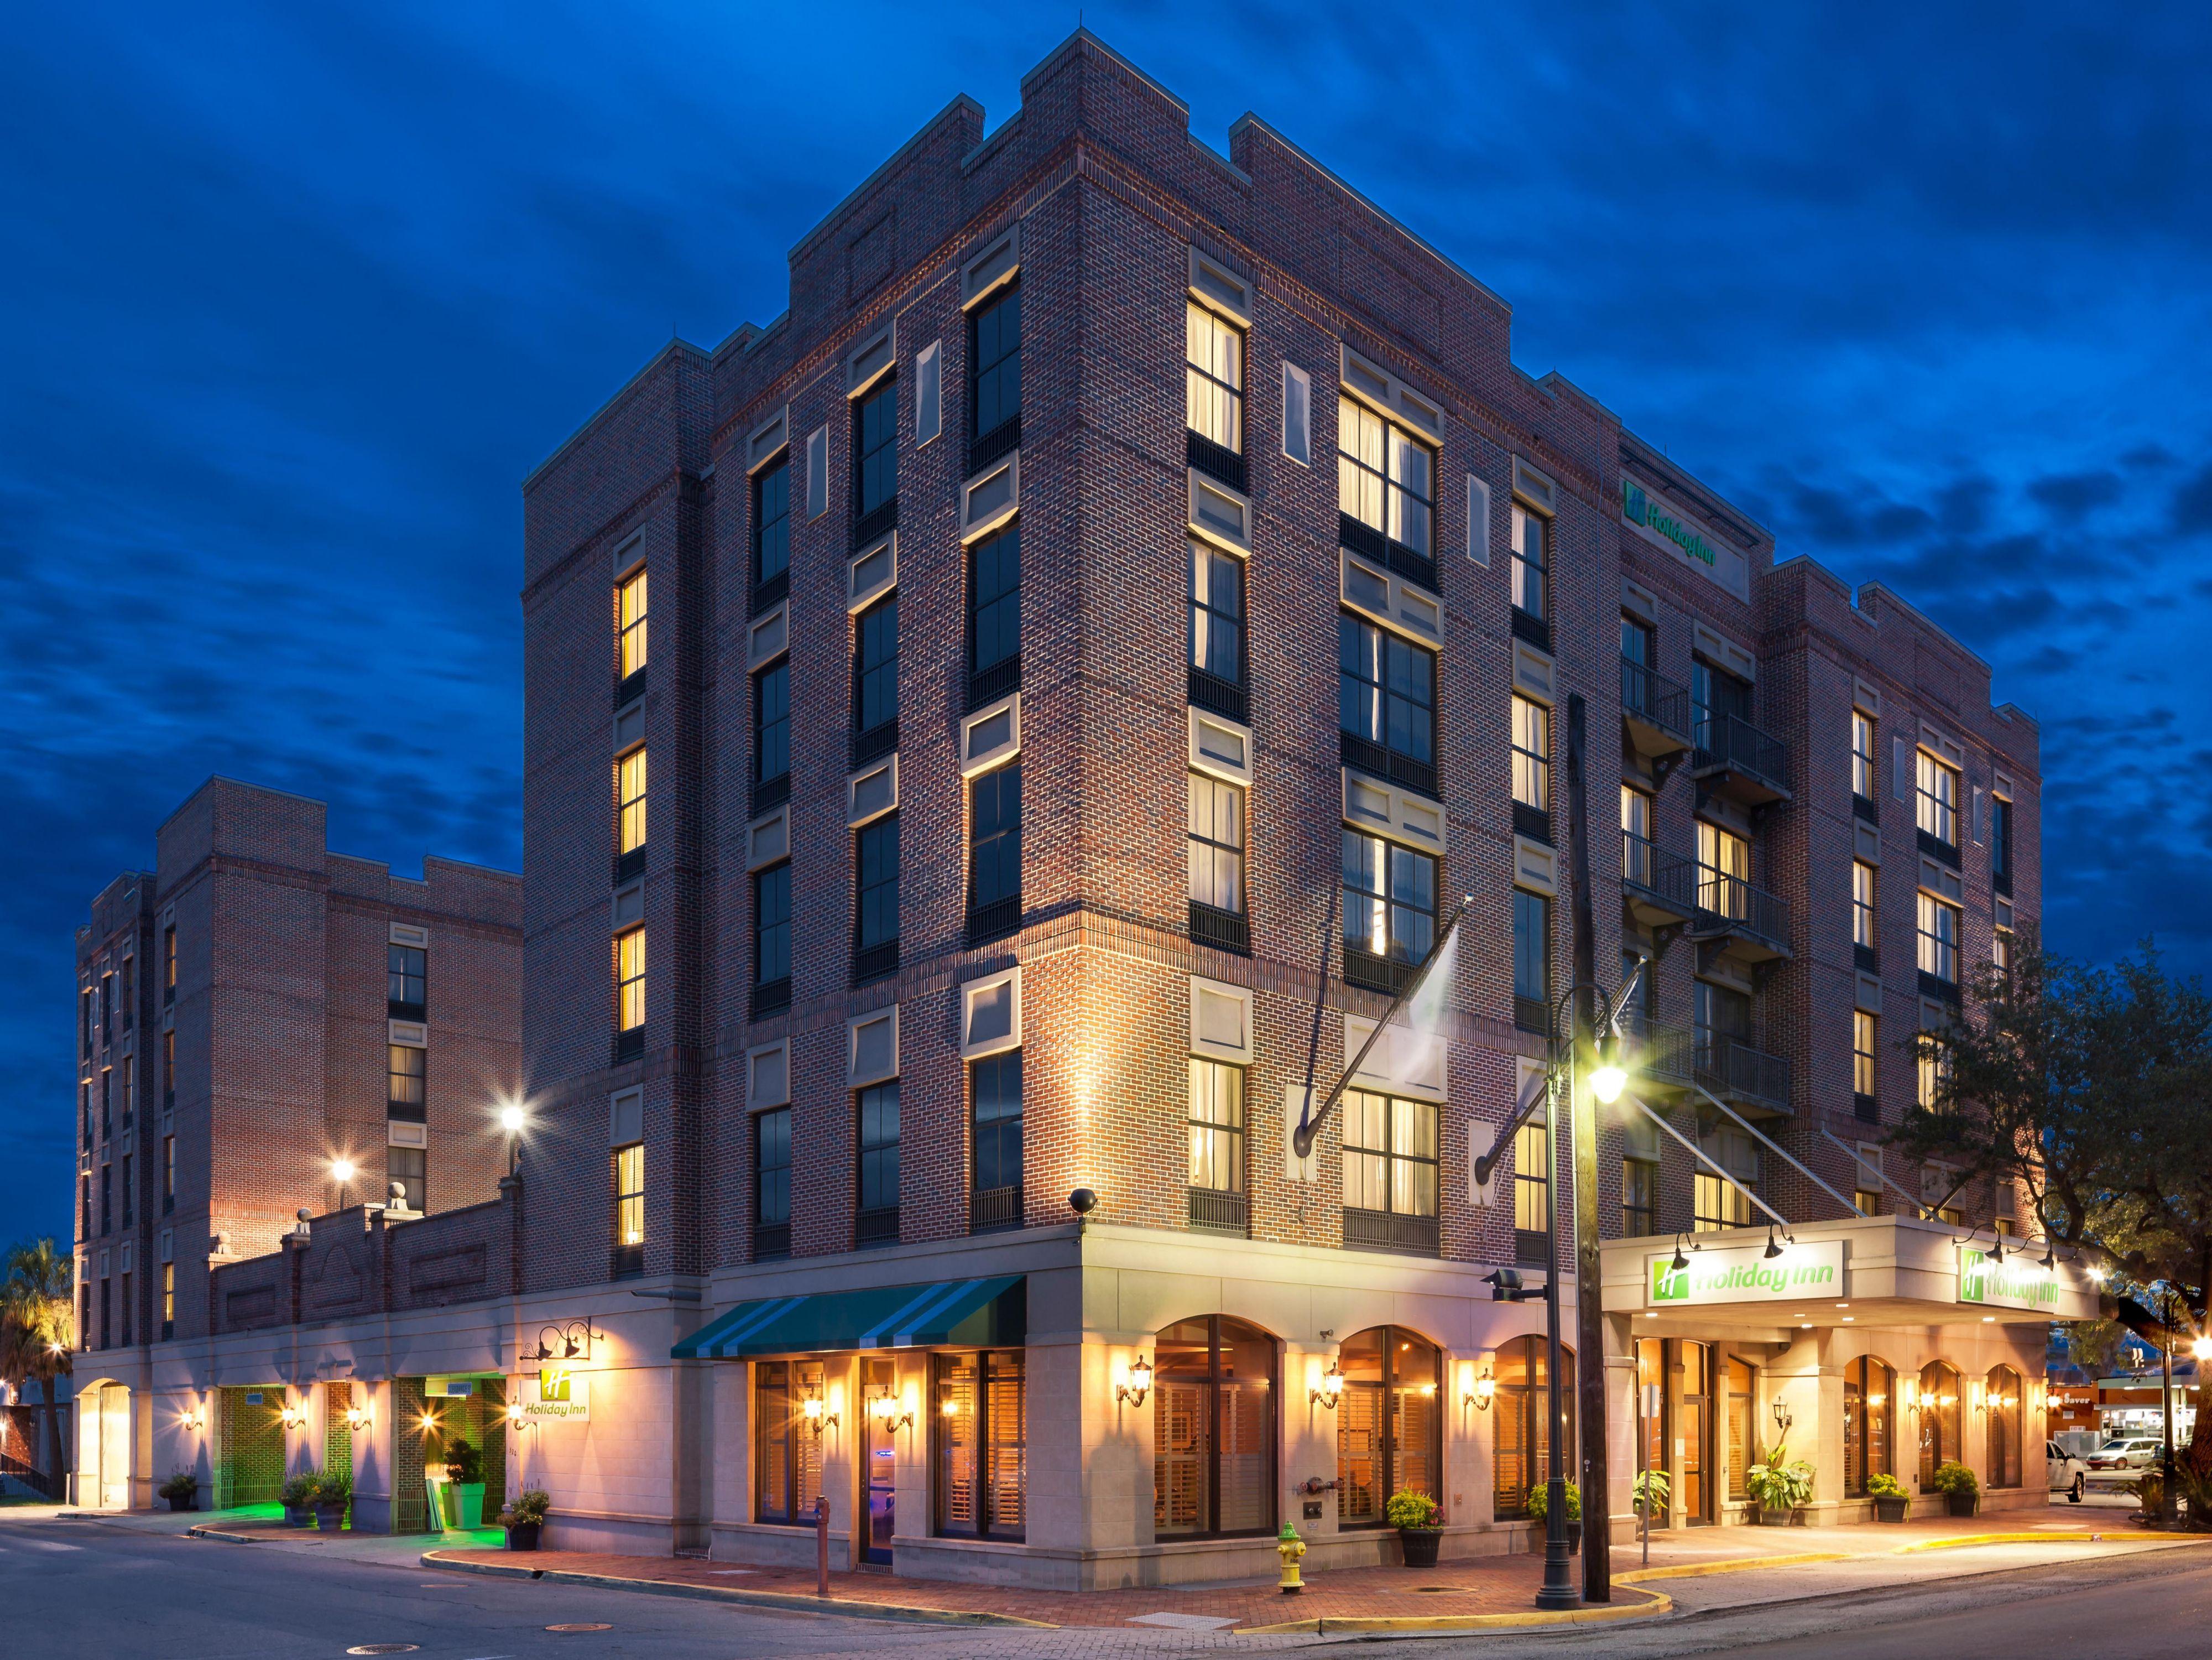 Astonishing Holiday Inn Savannah Historic District Hotel By Ihg Interior Design Ideas Clesiryabchikinfo